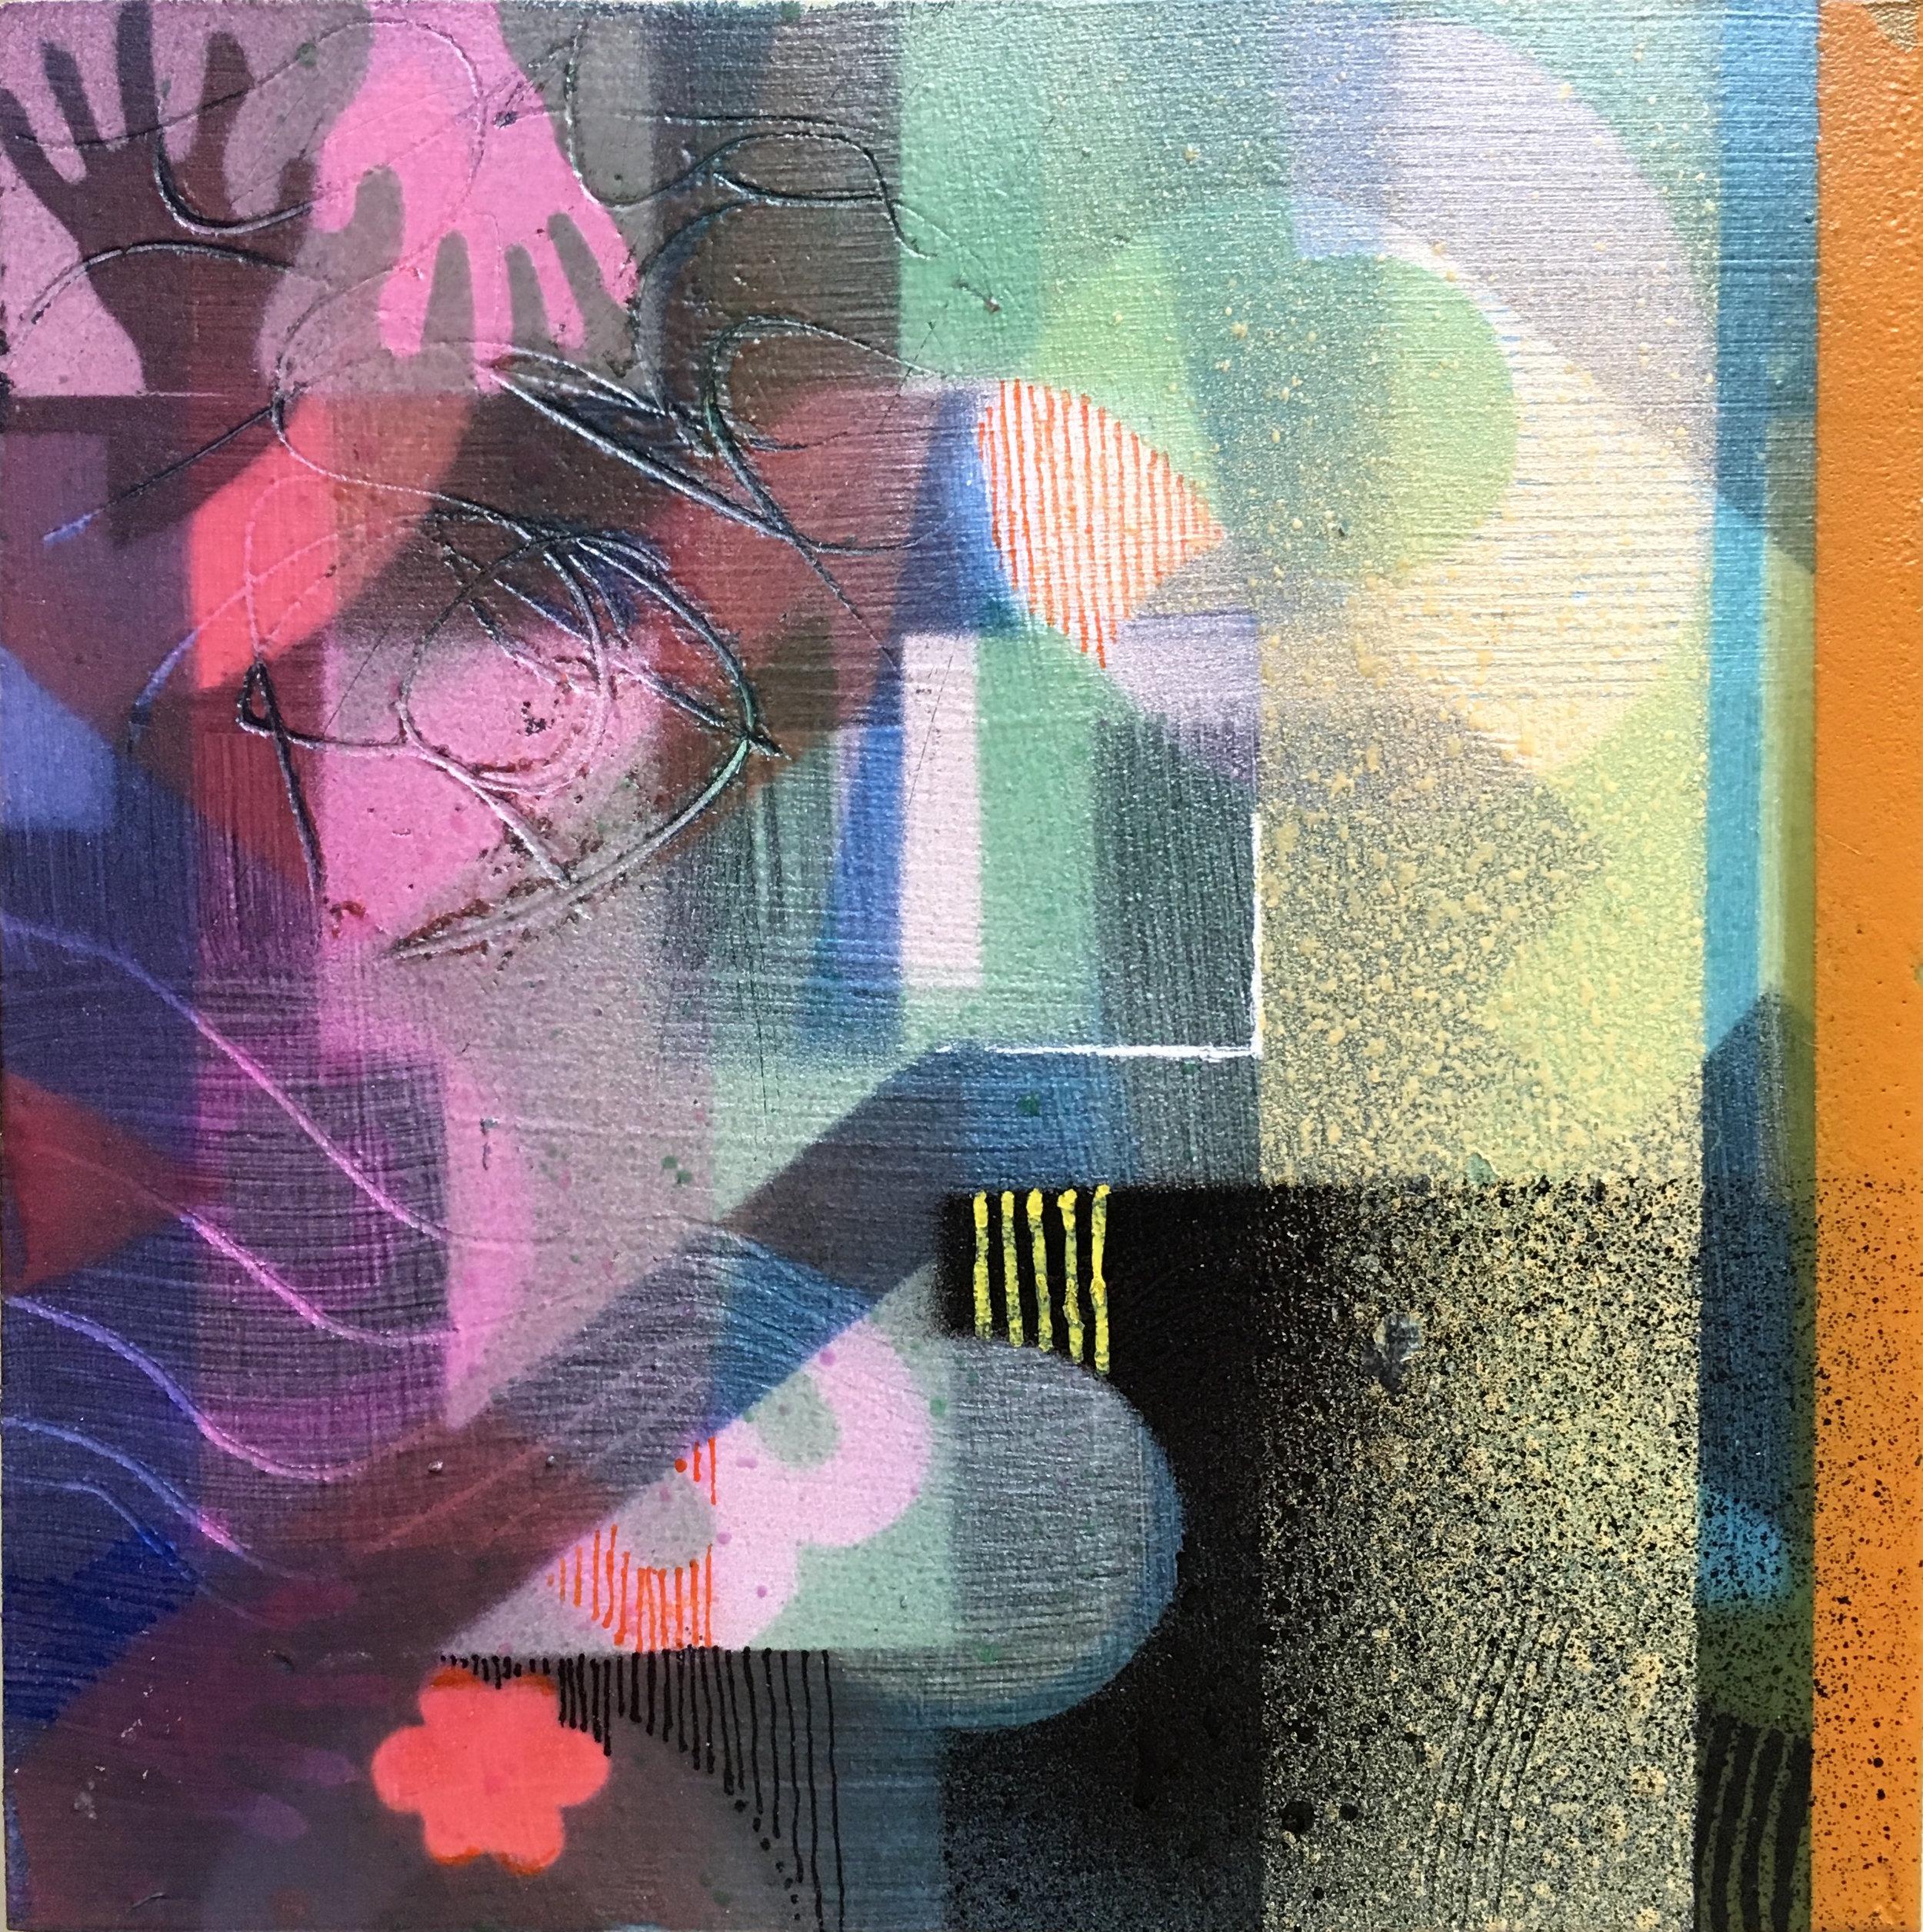 "Hand Dancing 5""x 5"" mixed media on cradled panel"